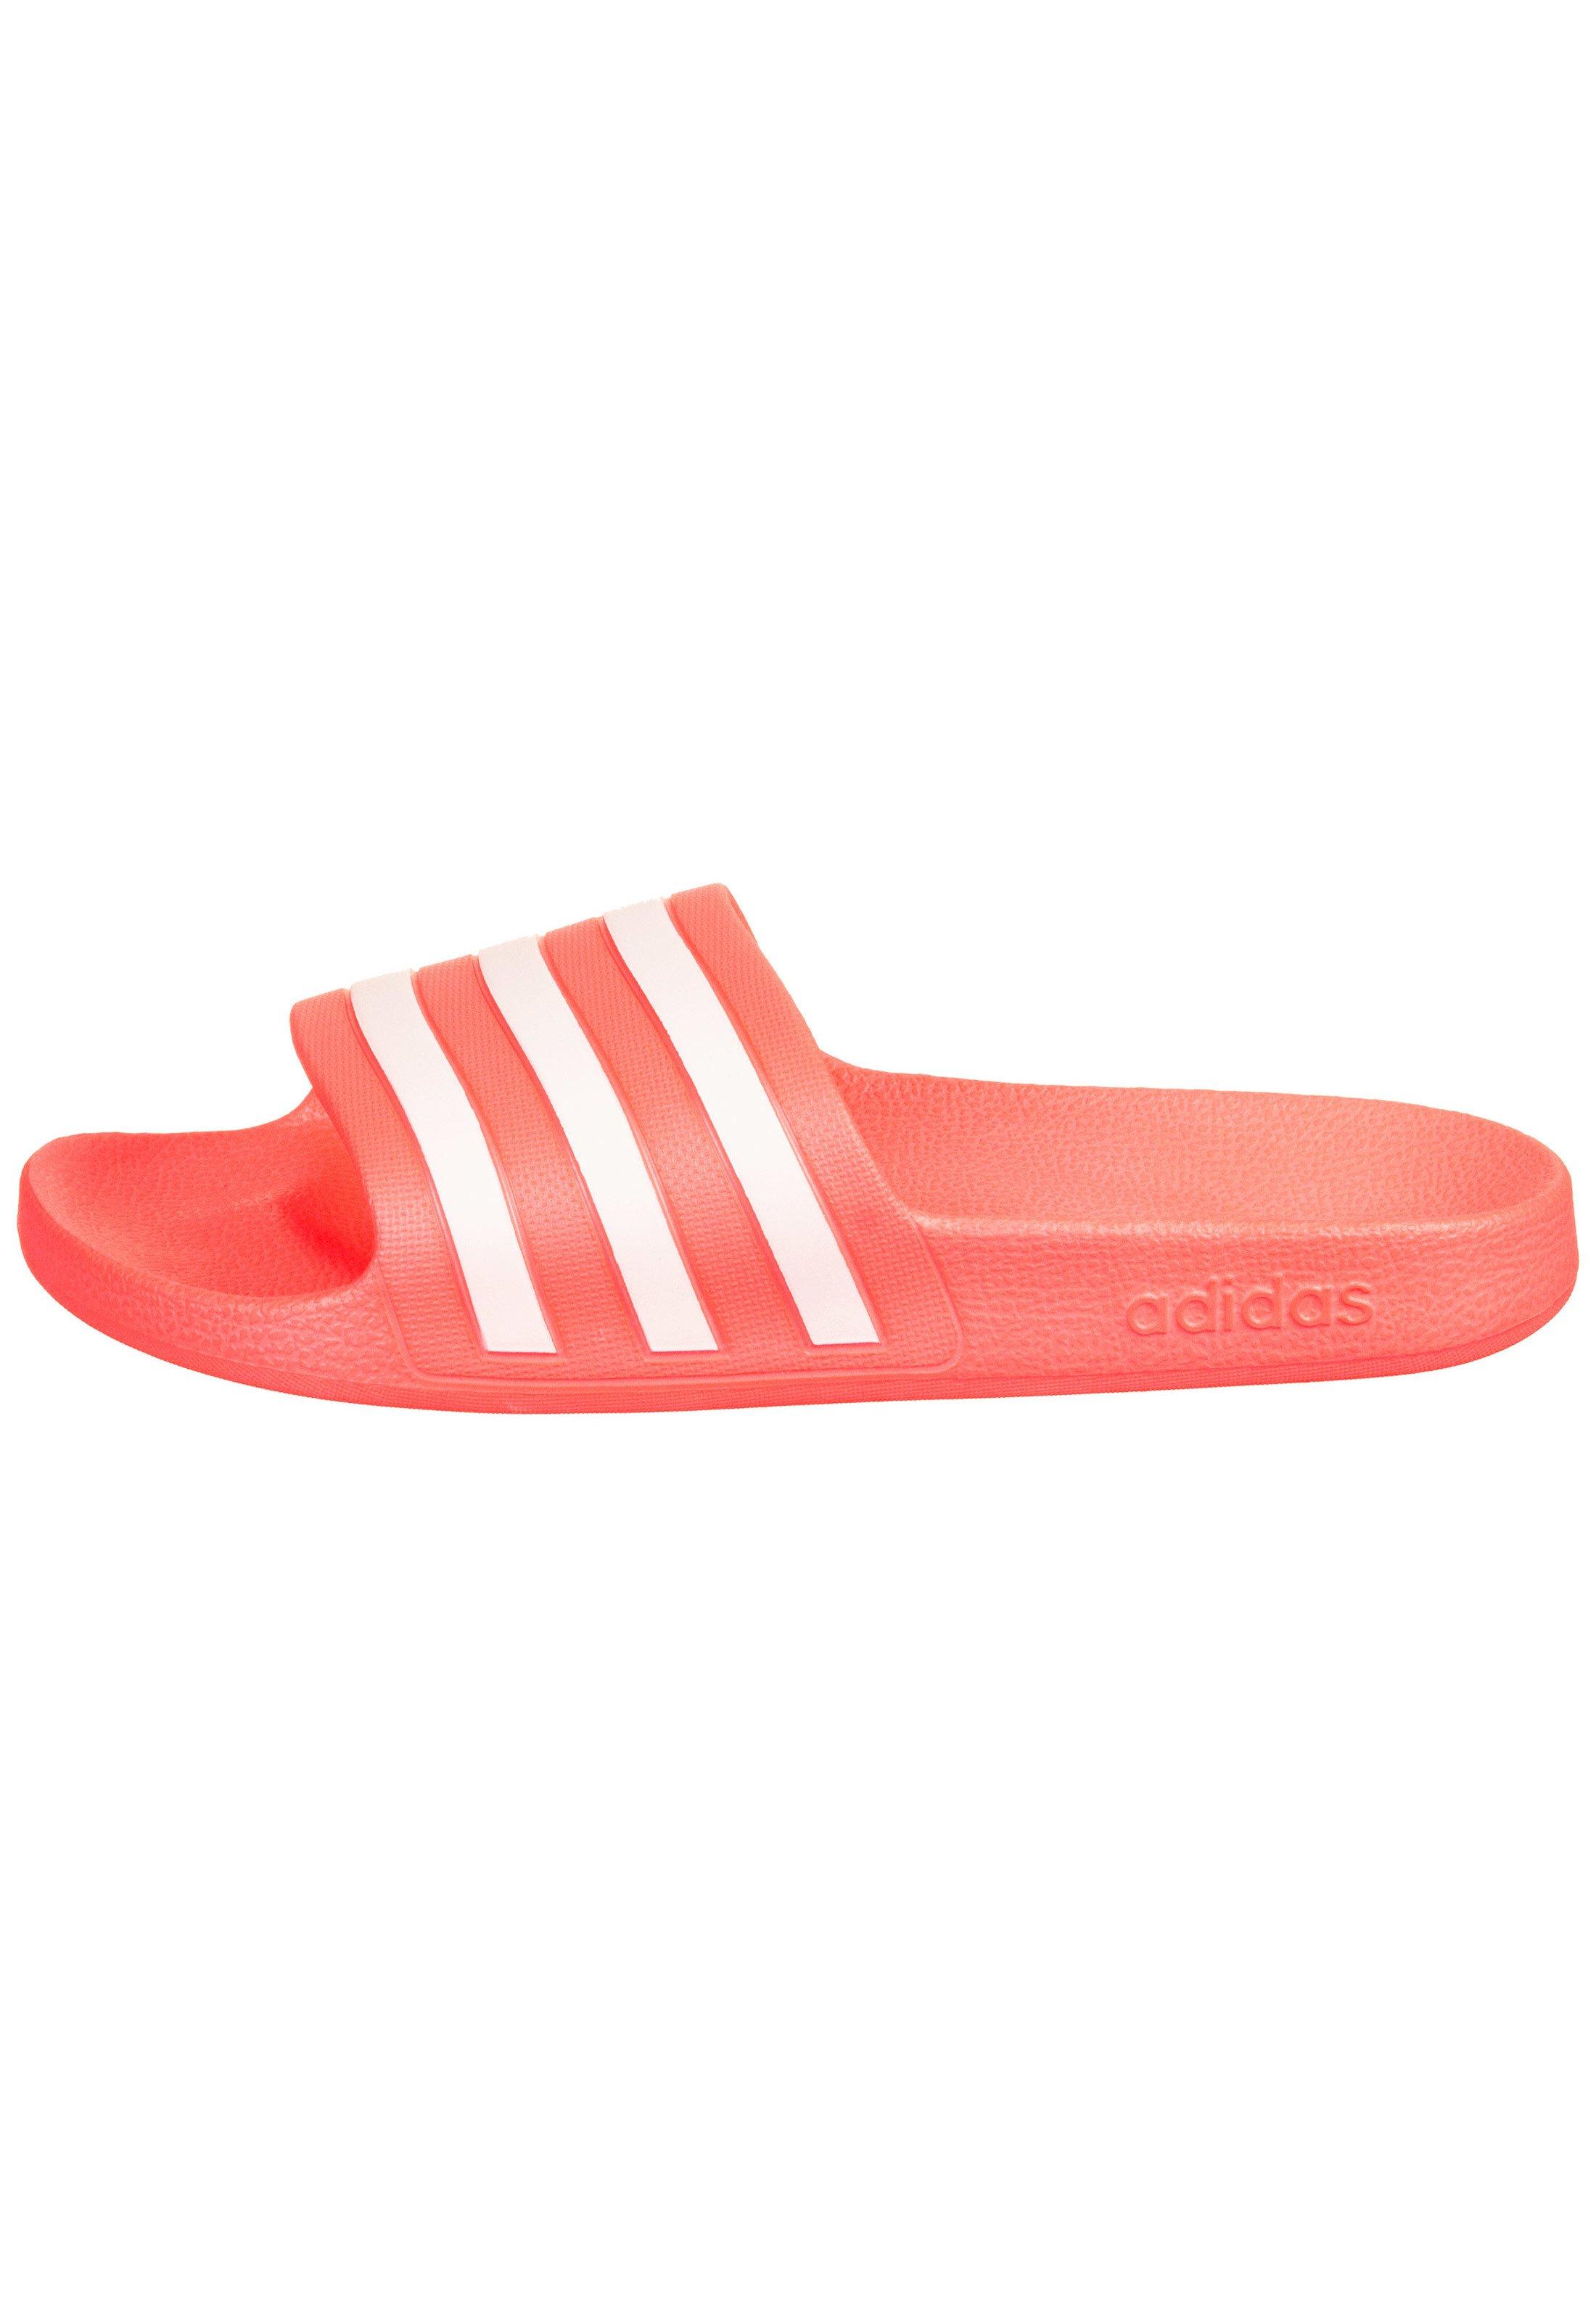 ADILETTE AQUA - Sandales de bain - signal pink/footwear white